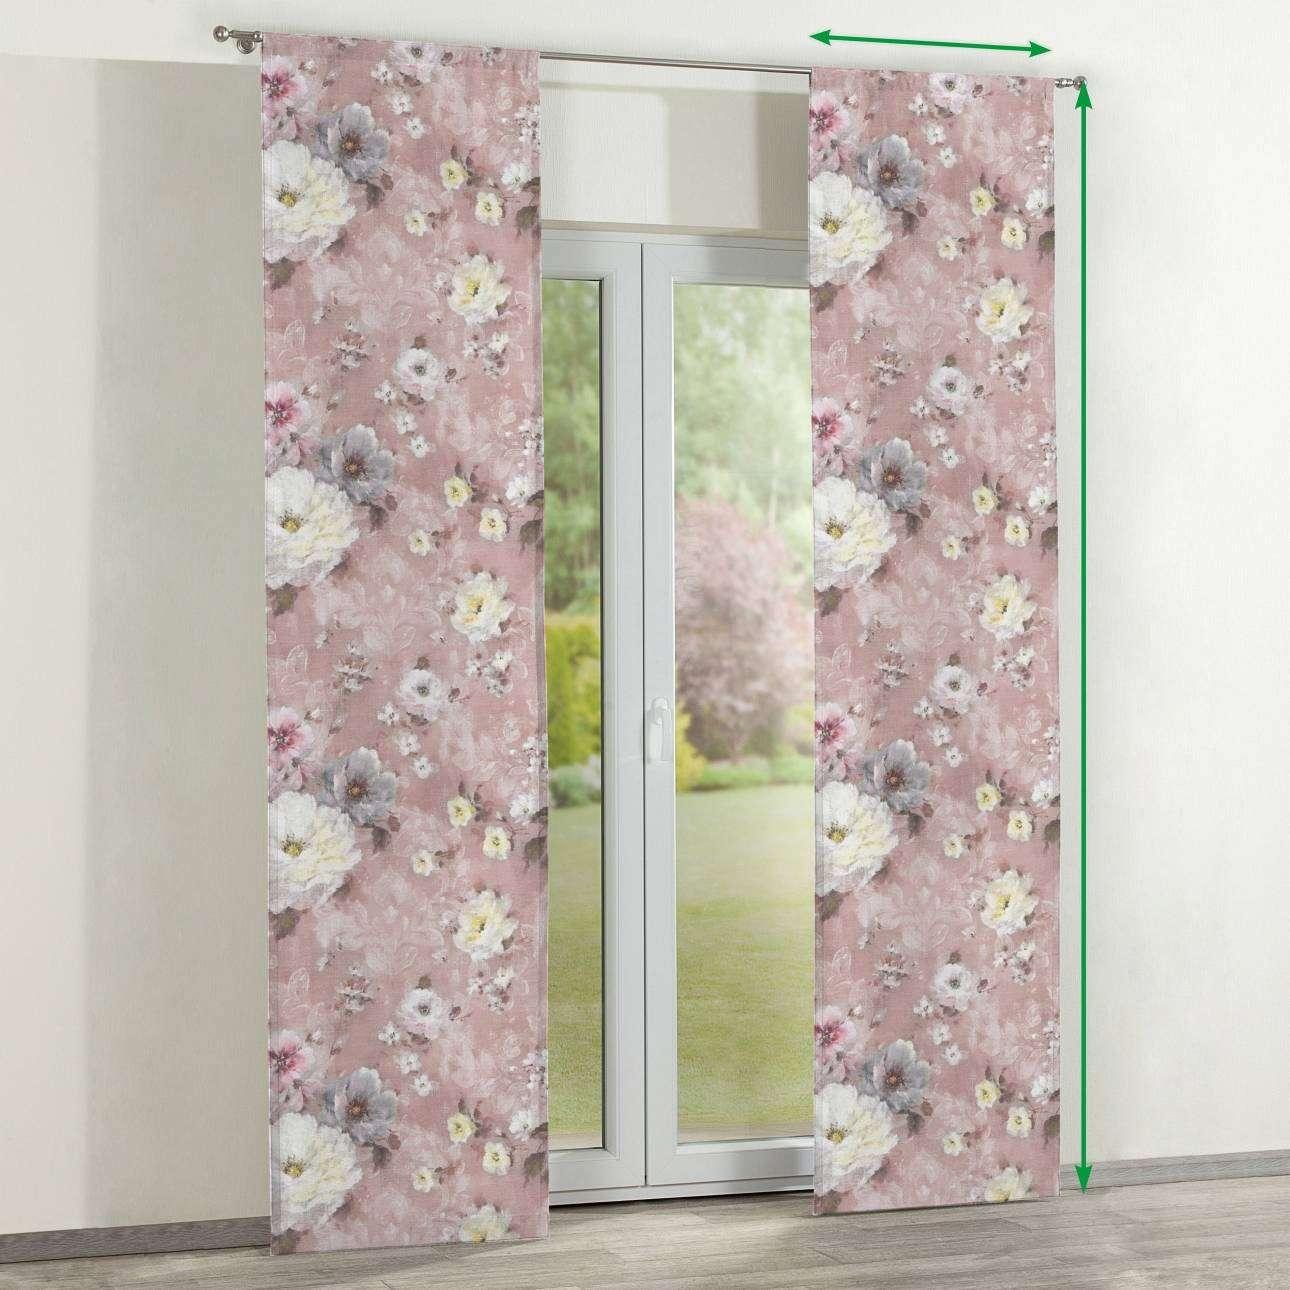 Panelové závesy 2 ks V kolekcii Flowers, tkanina: 137-83